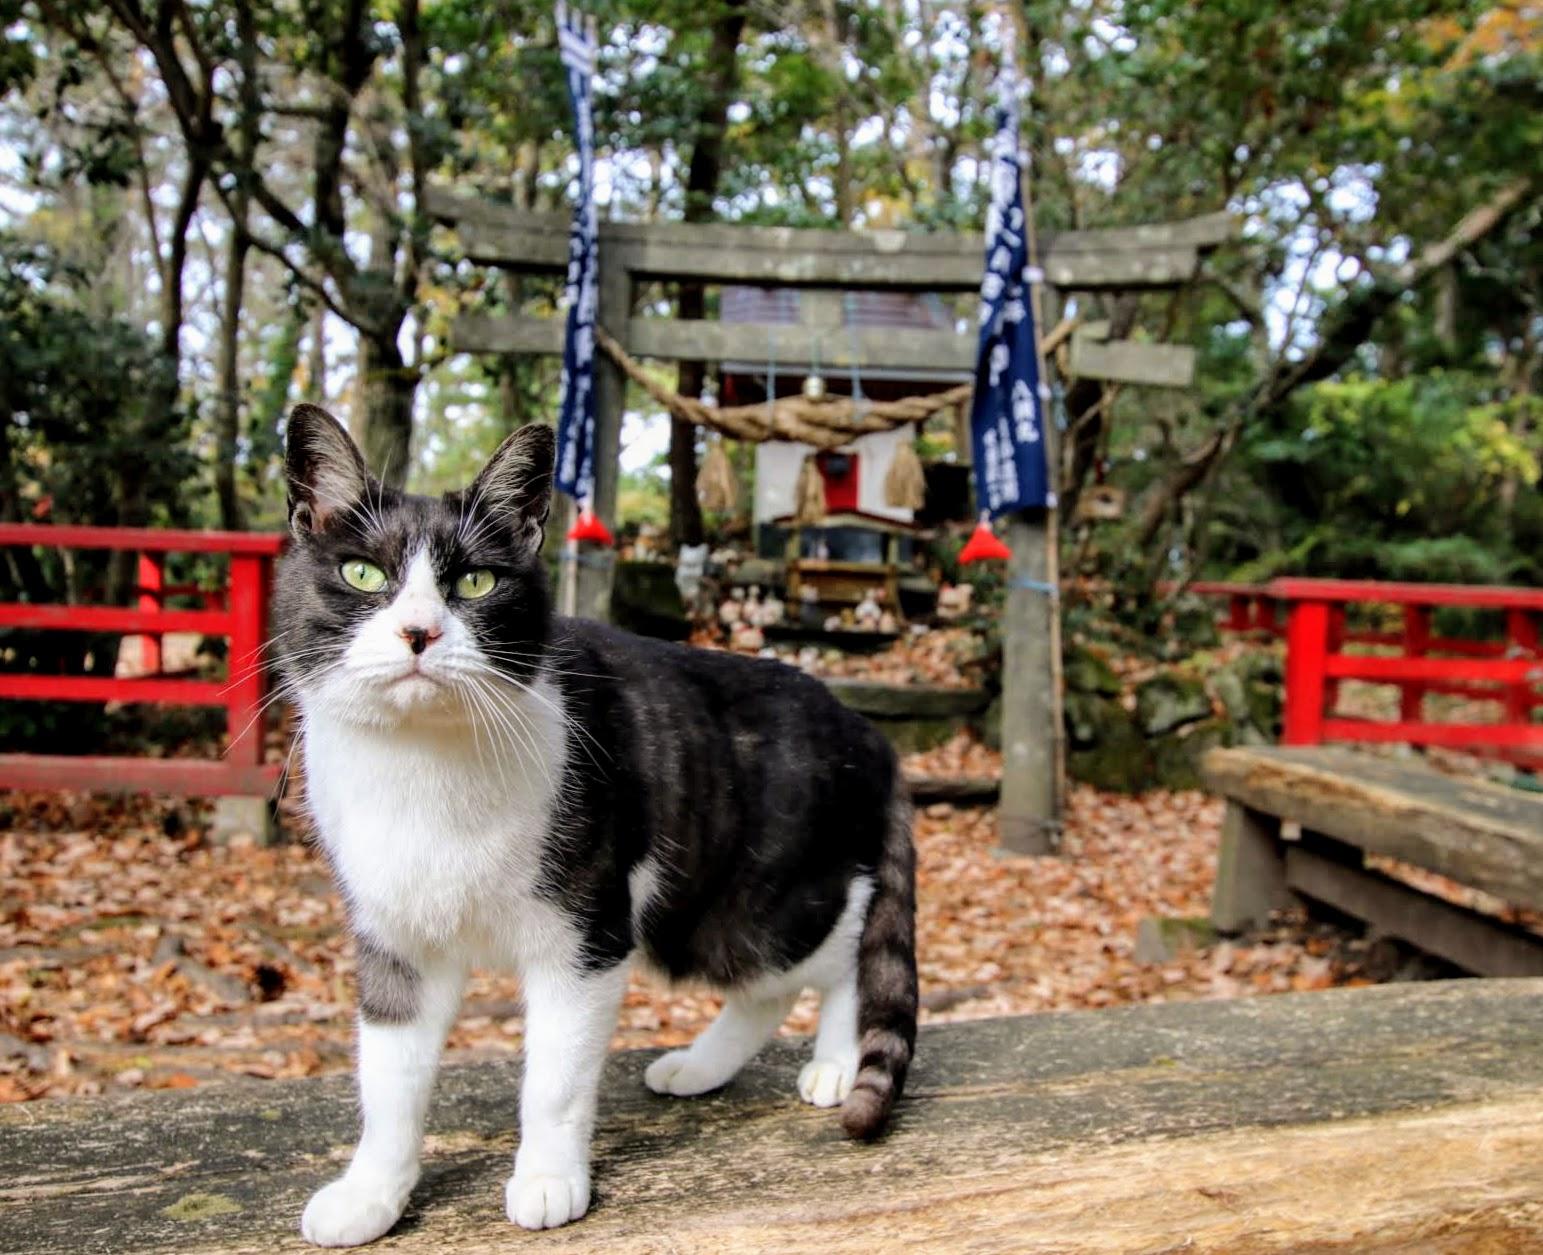 Tashirojima: A Guide to Visiting Japan's Famous Cat Island | Japan Cheapo